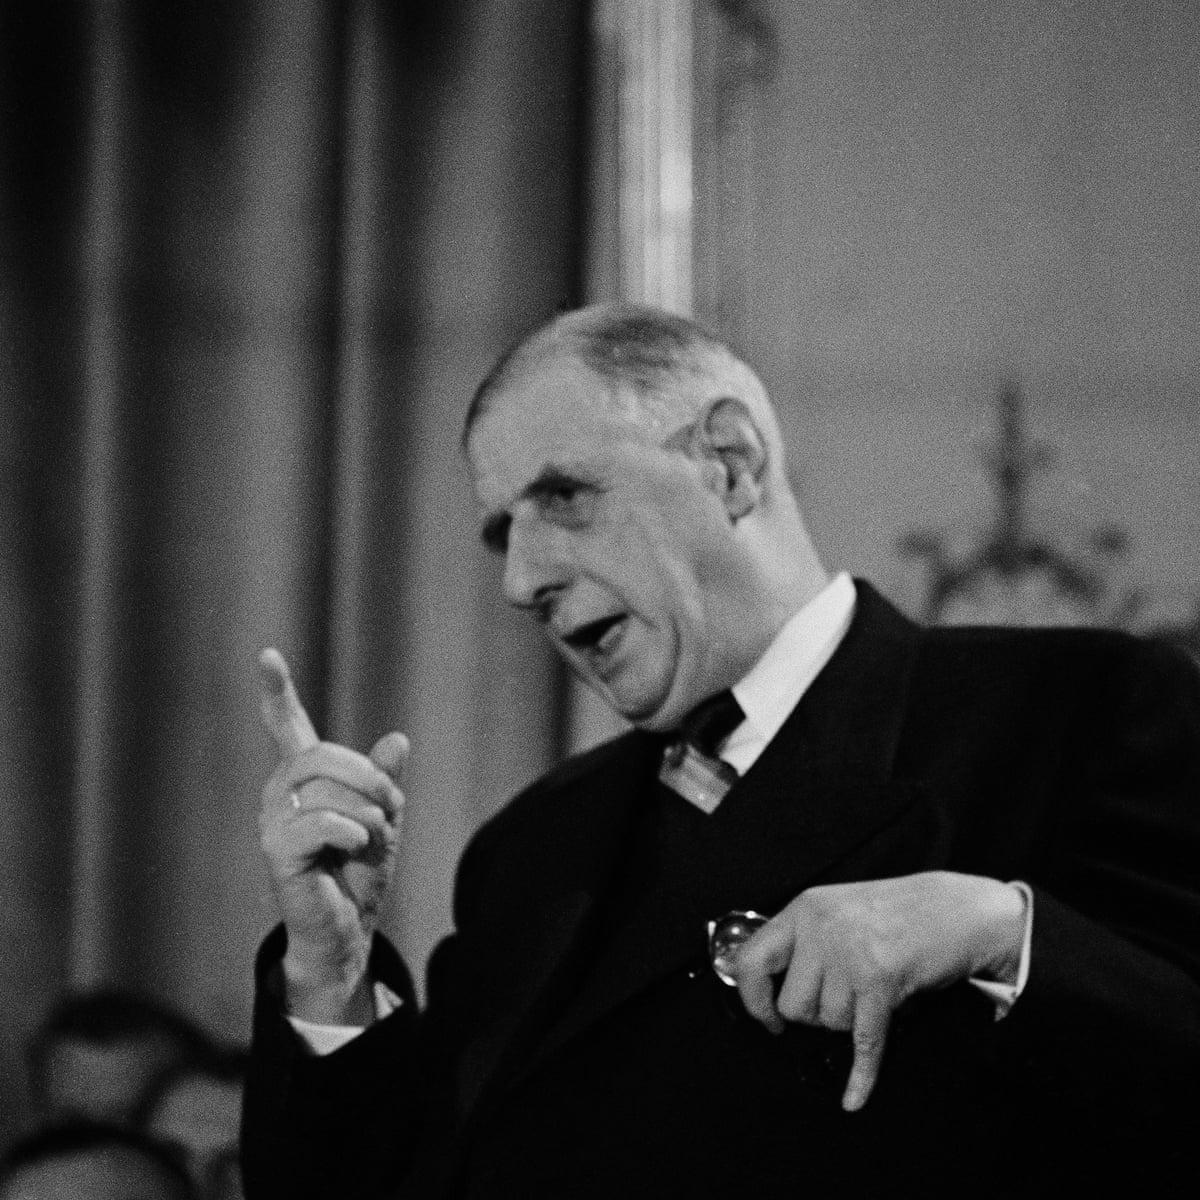 De Gaulle Returns To Power Archive June 1958 Charles De Gaulle The Guardian De Gaulle